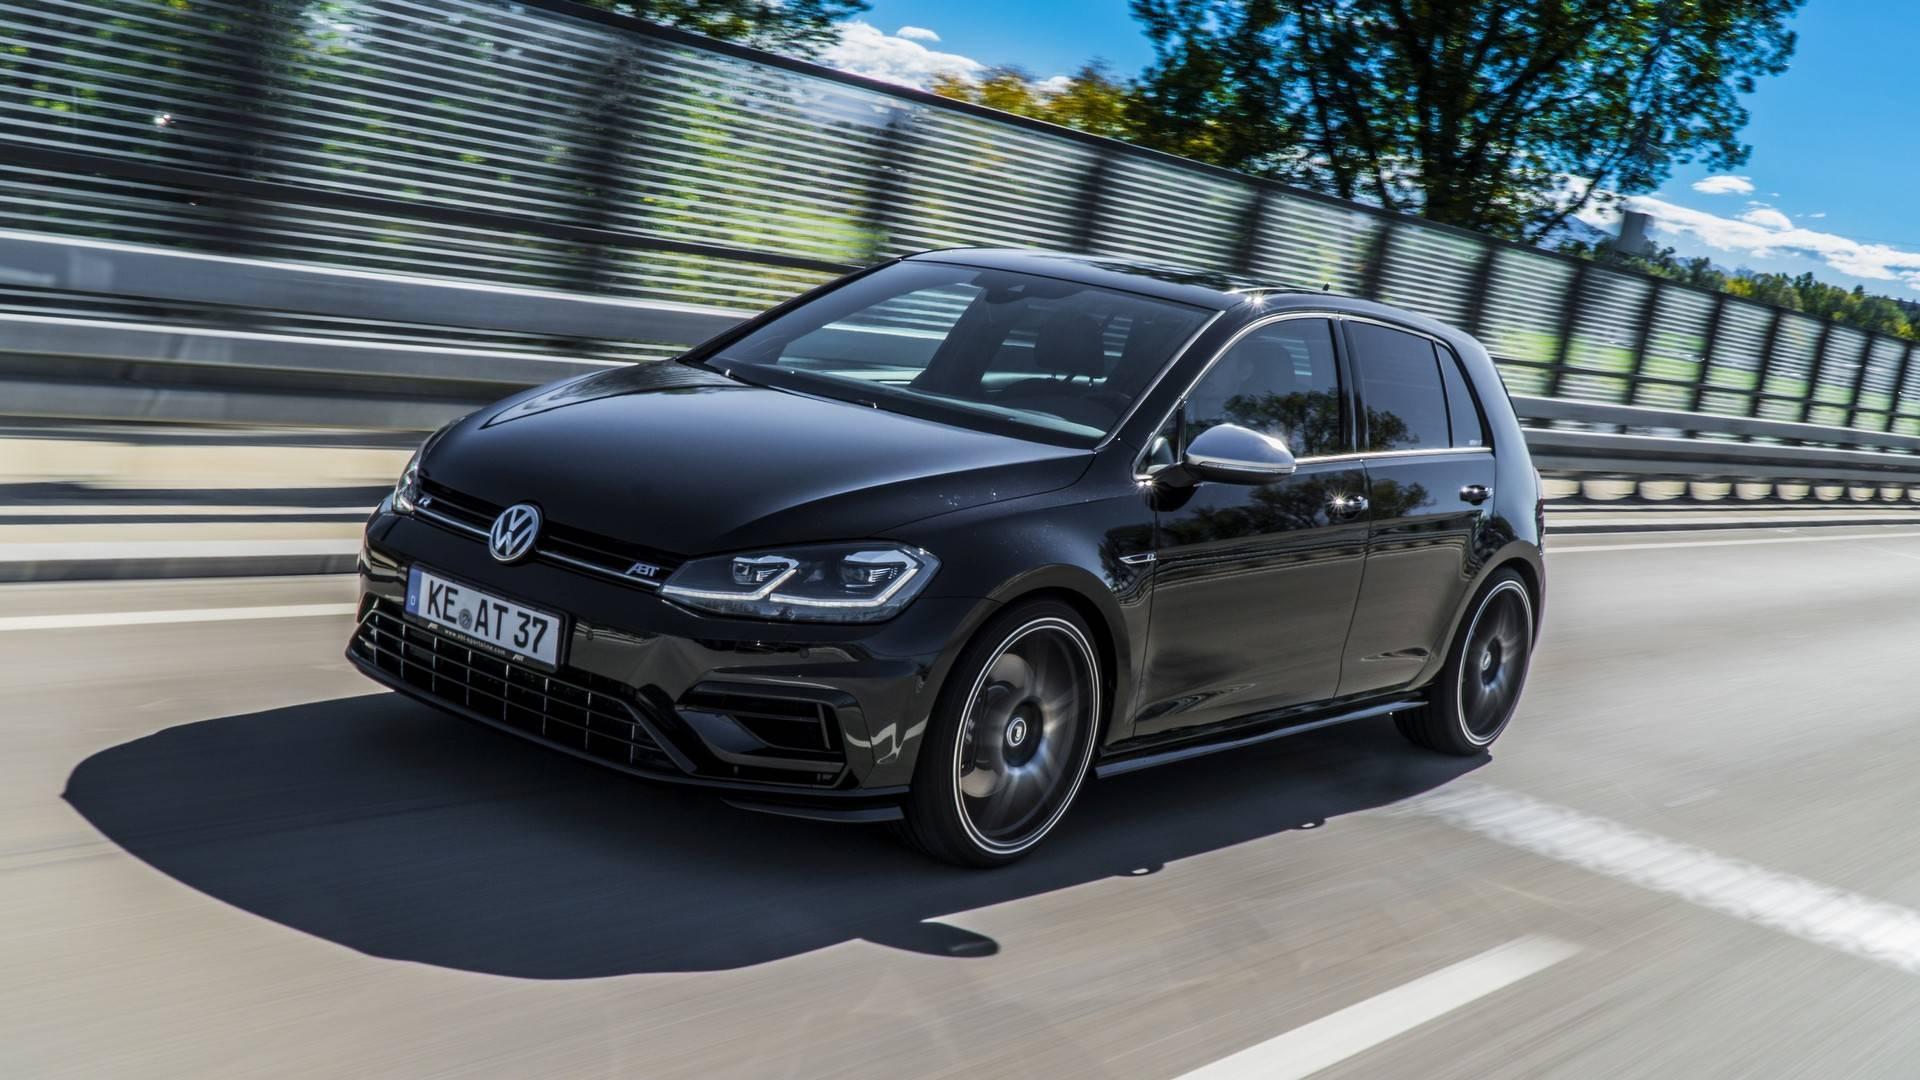 The Abt Golf R Is The Golf R400 Volkswagen Won T Make Autoevolution